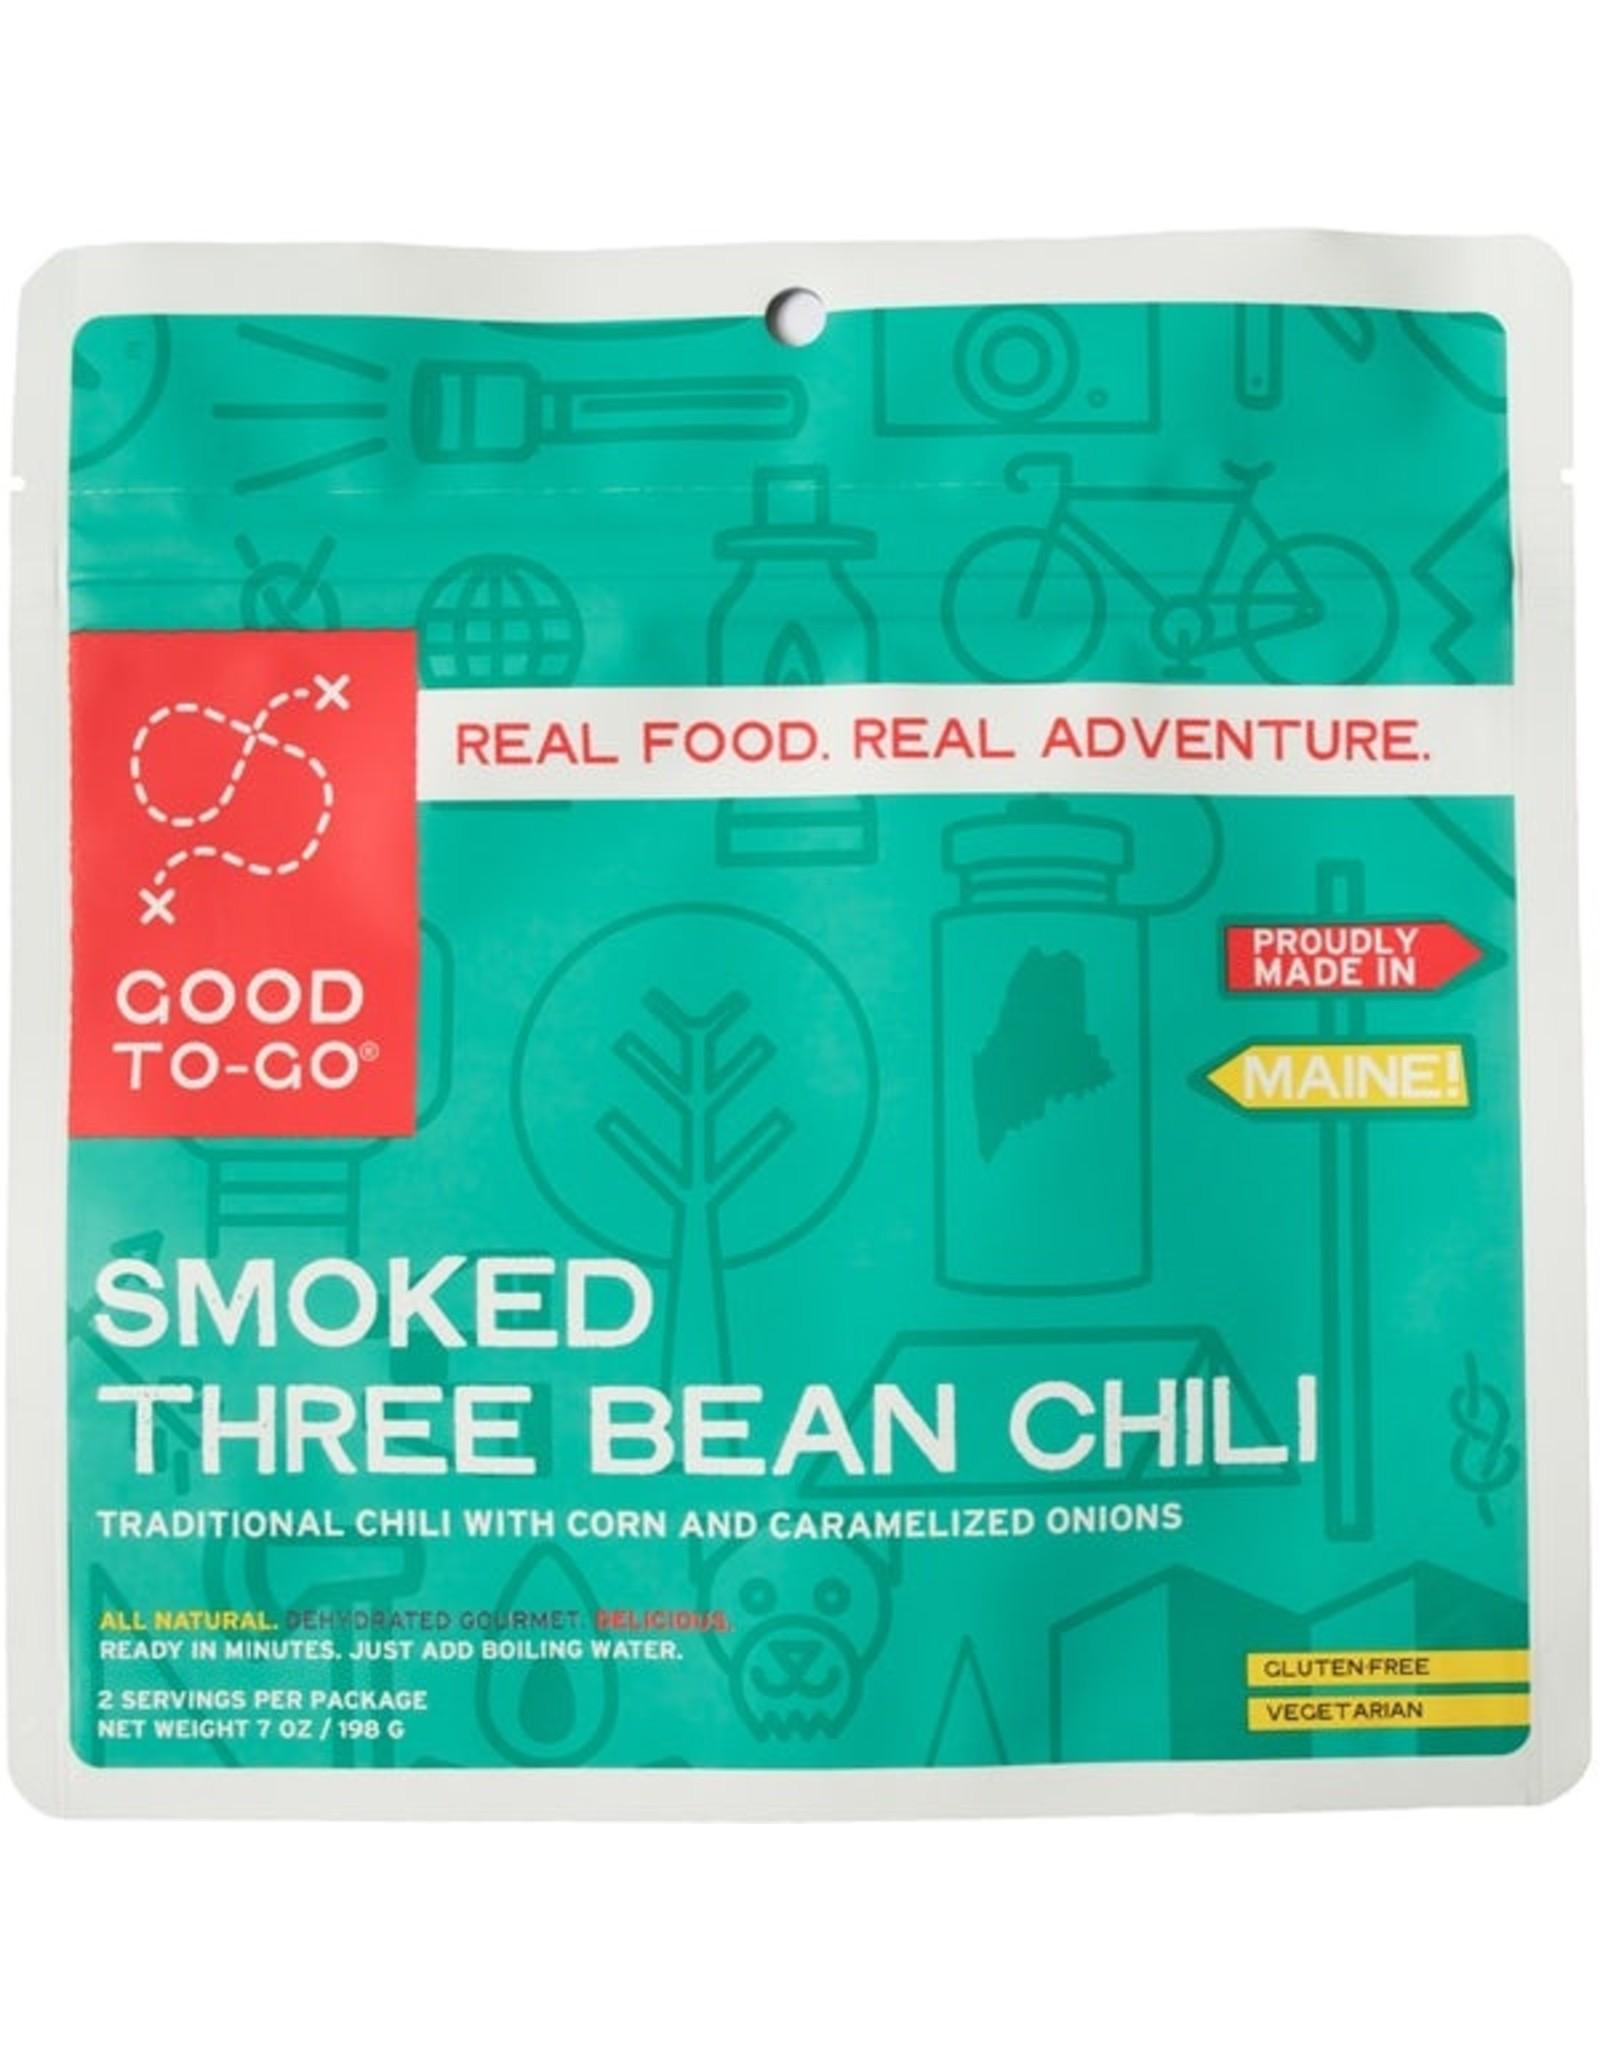 GOOD TO-GO Three Bean Chili